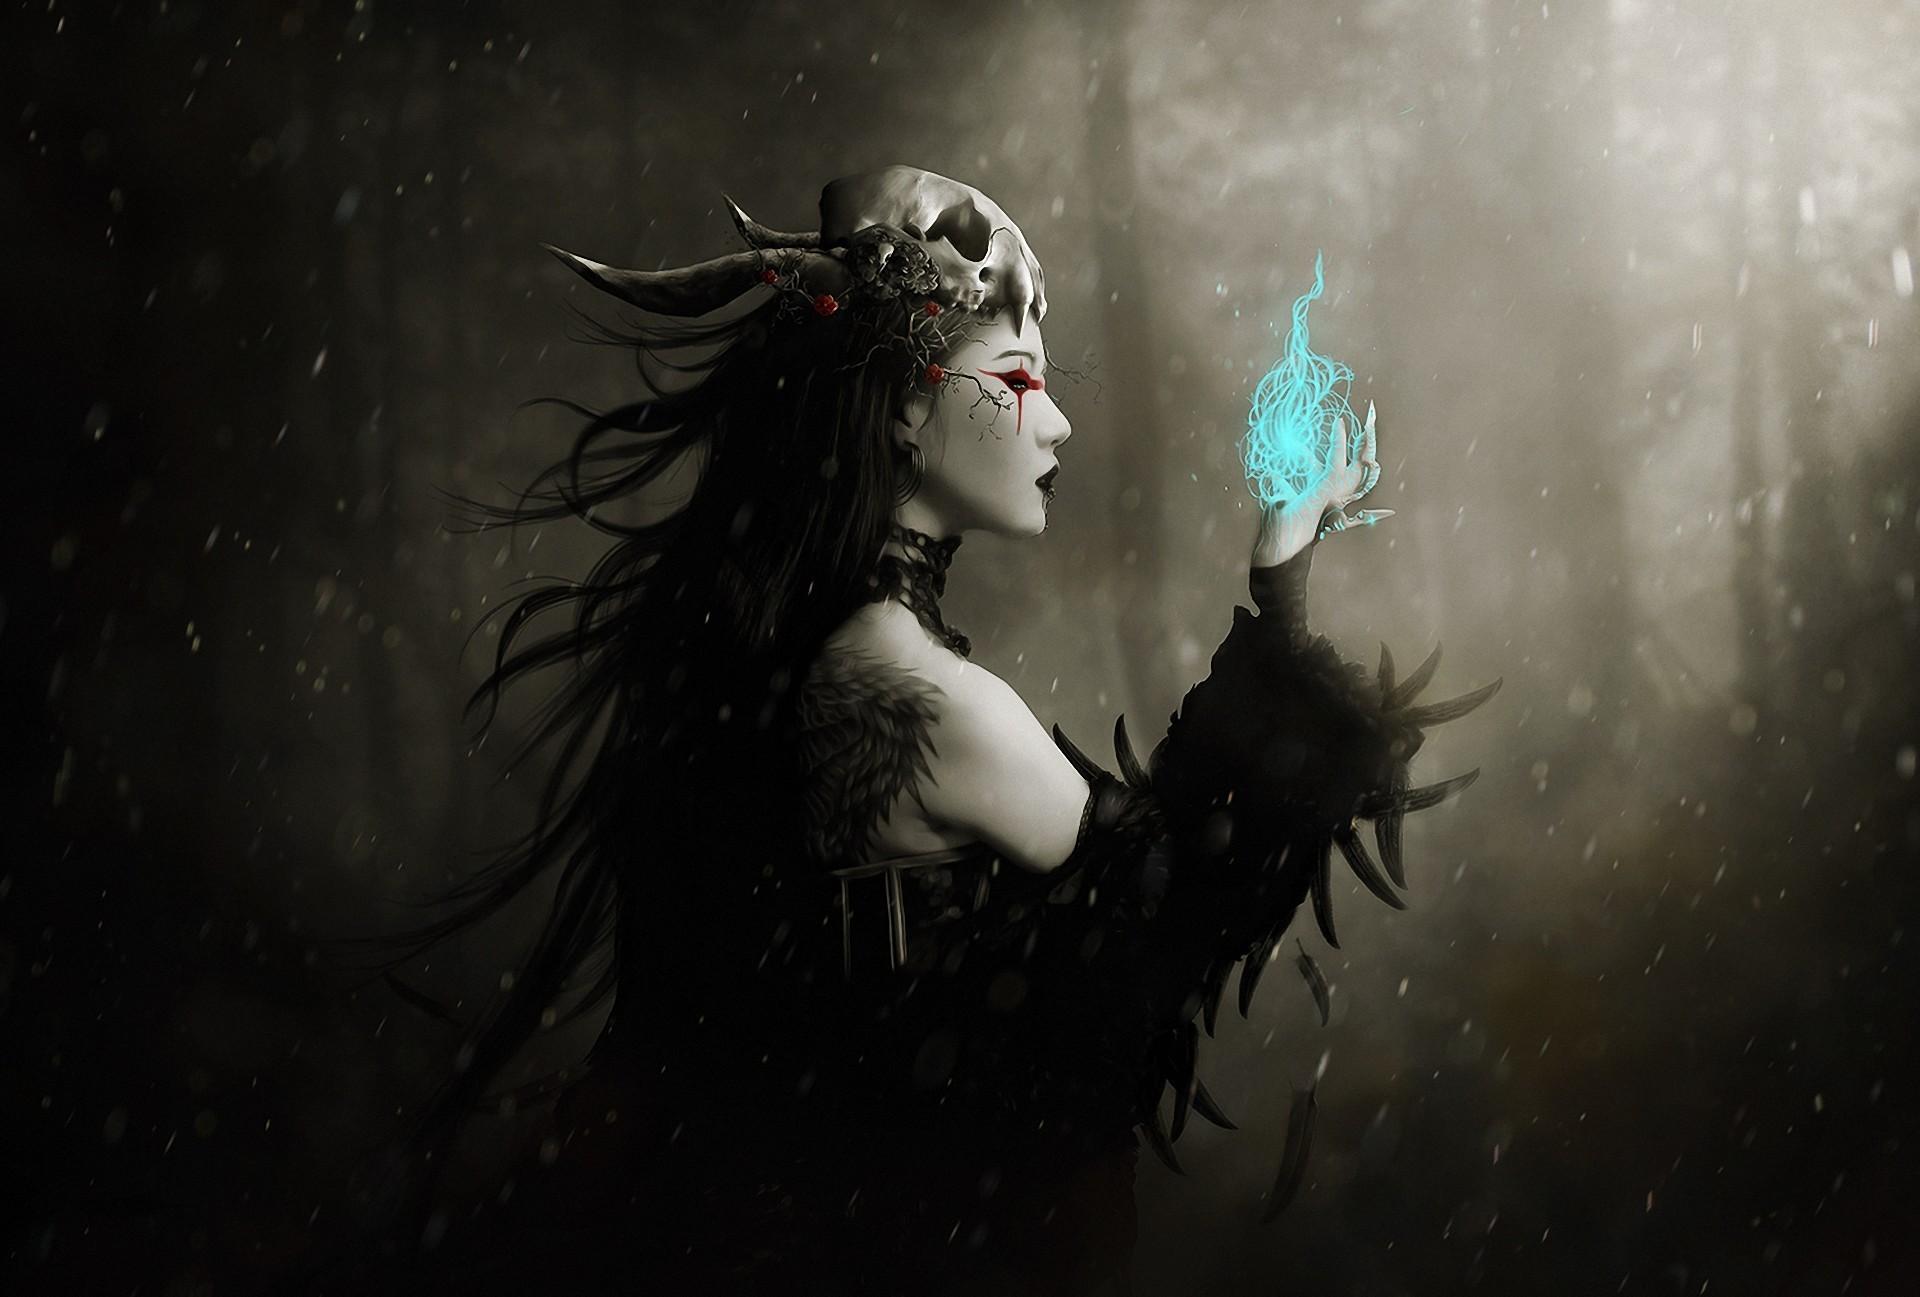 Heavy metal gothic girls porn music video